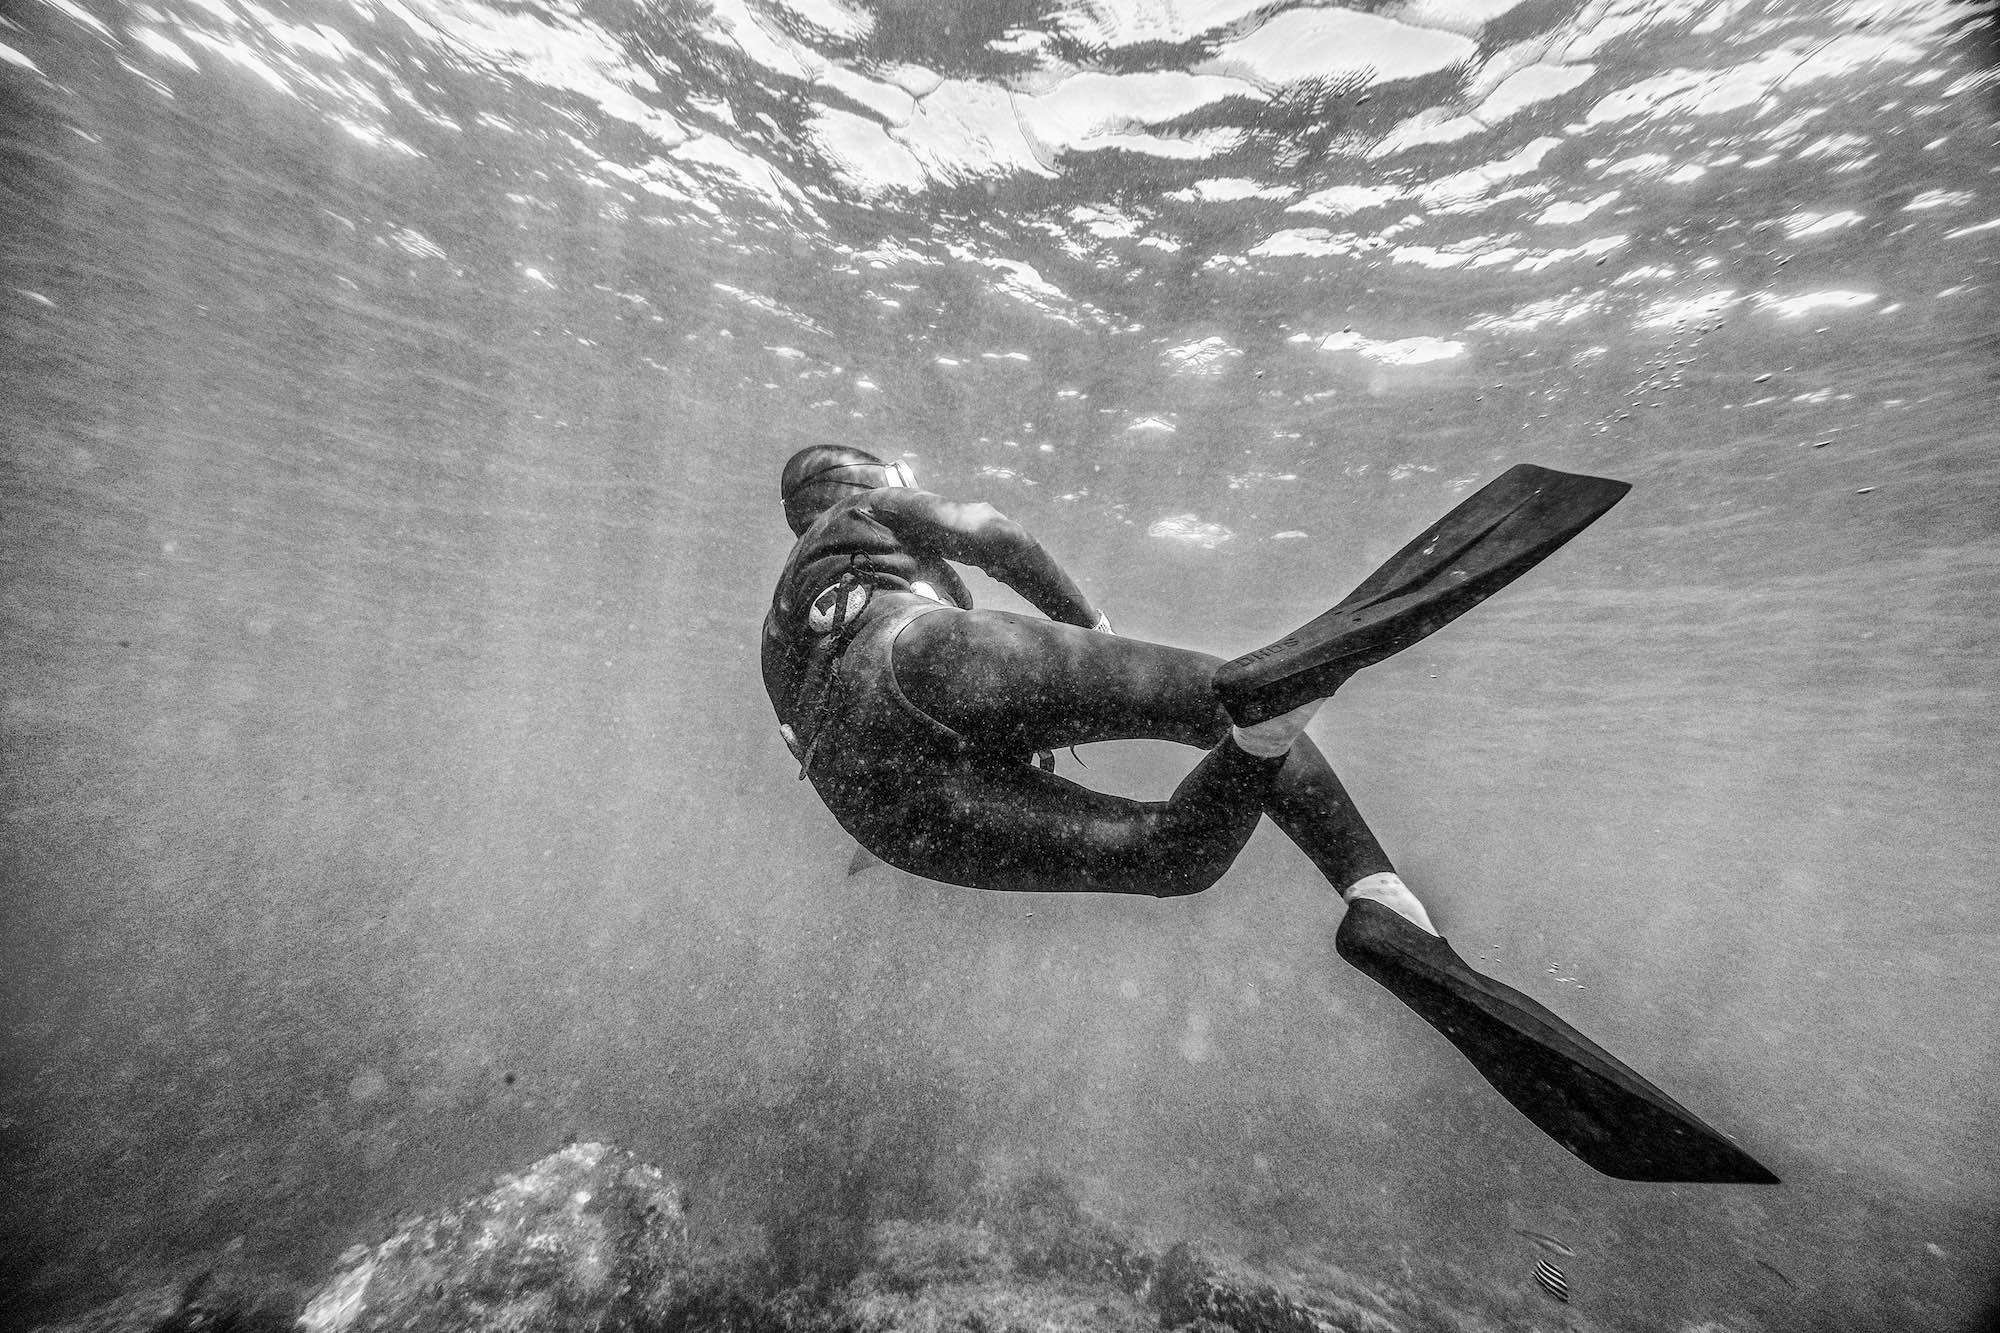 Haenyeo Women Divers Jeju Island Underwater Documentary Photography 5